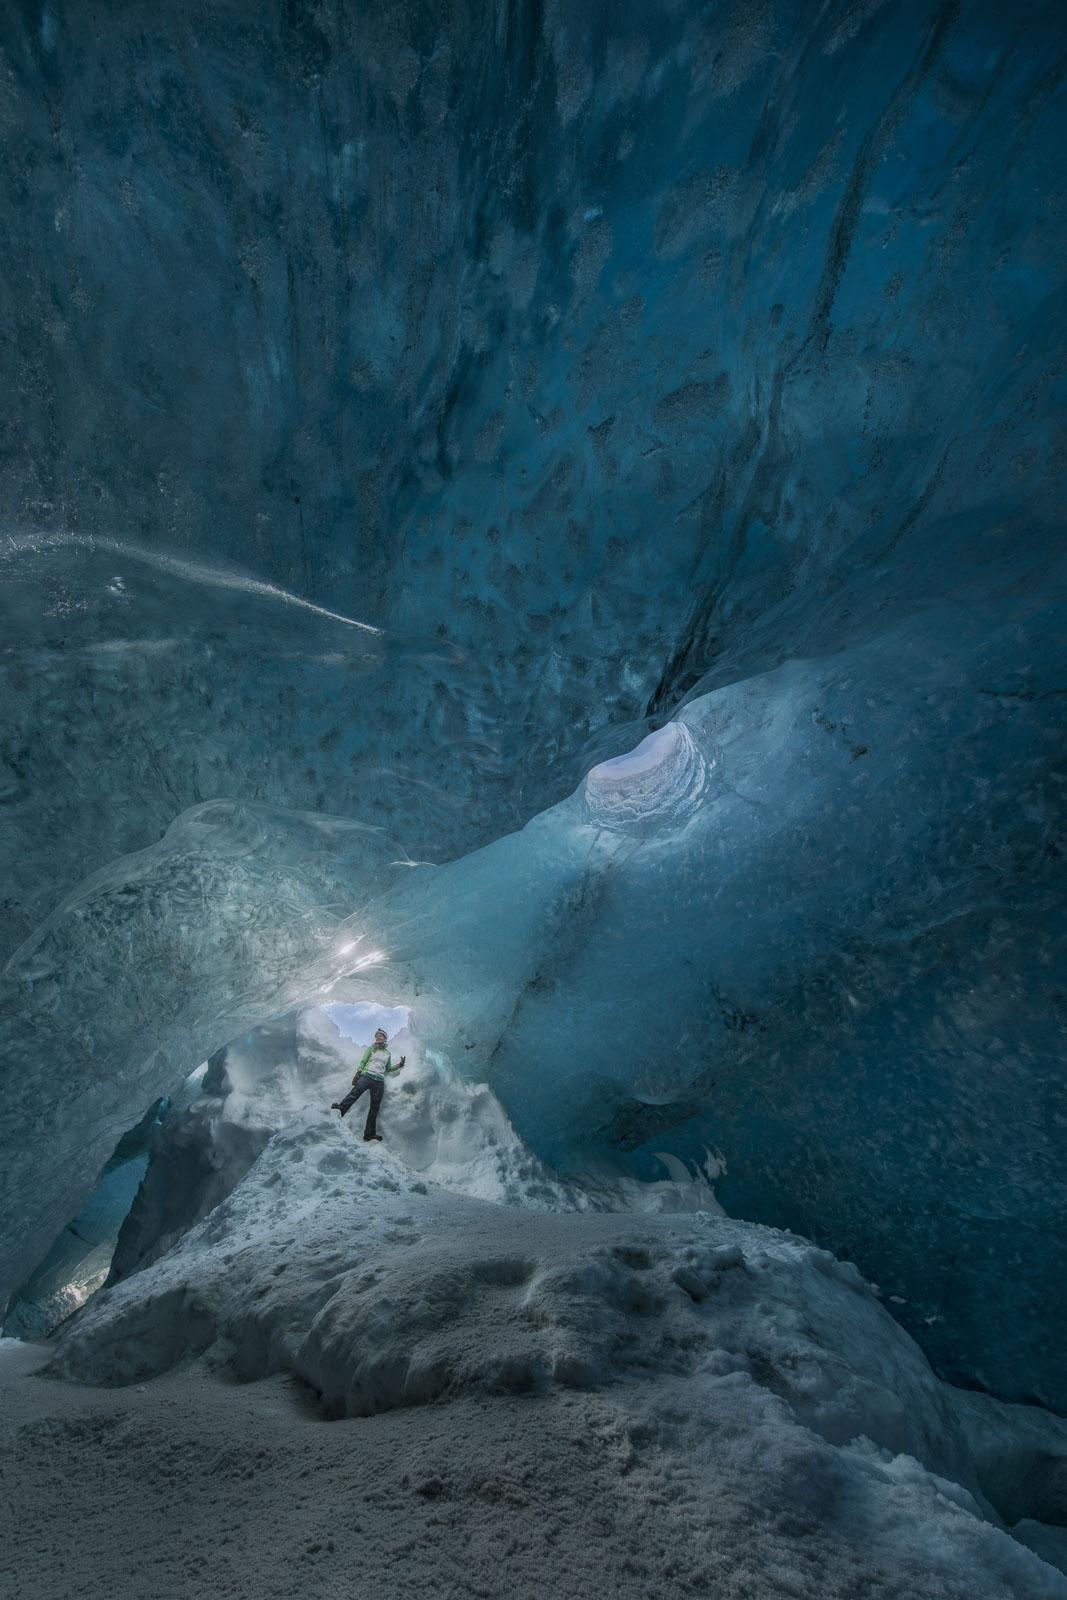 icecave-5.jpg